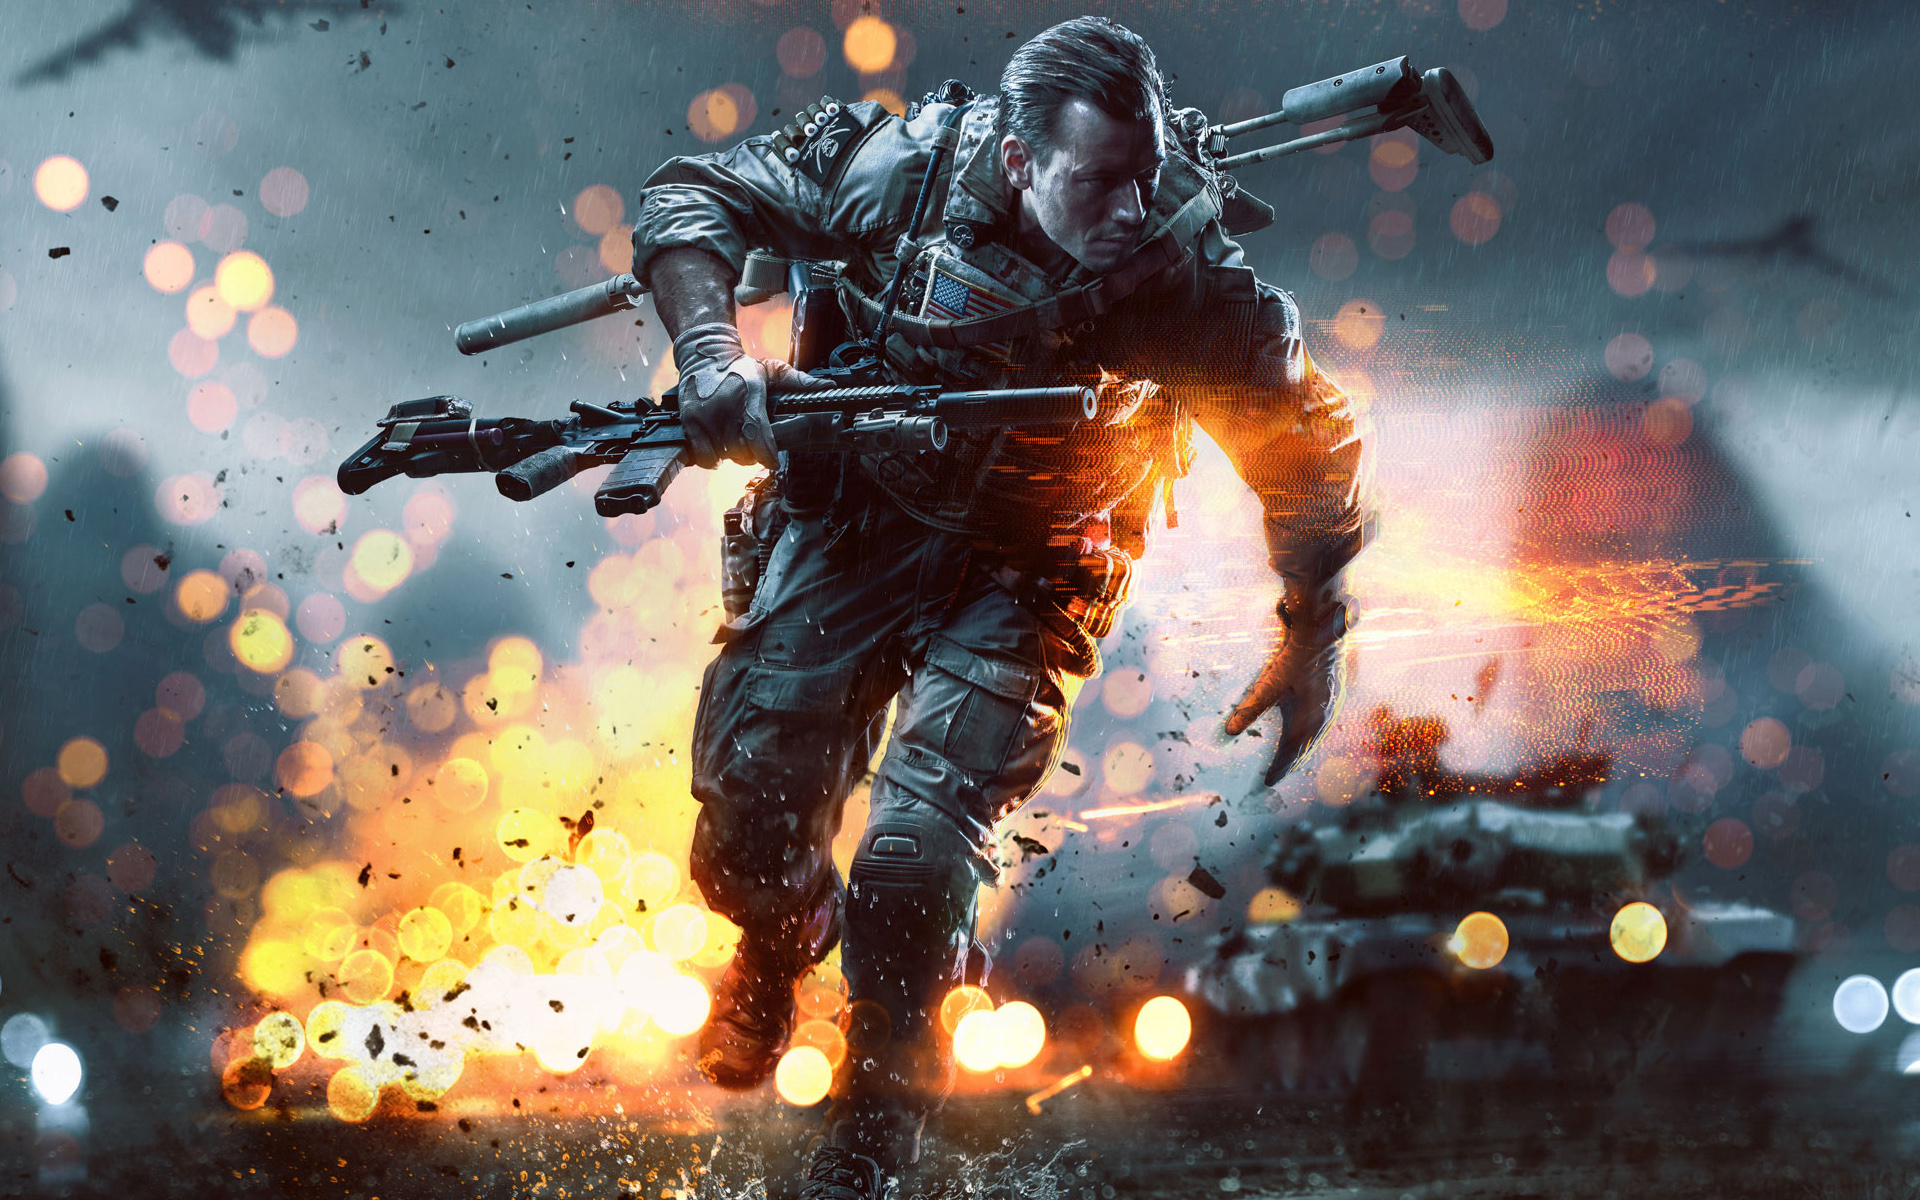 Battlefield 4 China Rising Wallpapers | HD Wallpapers